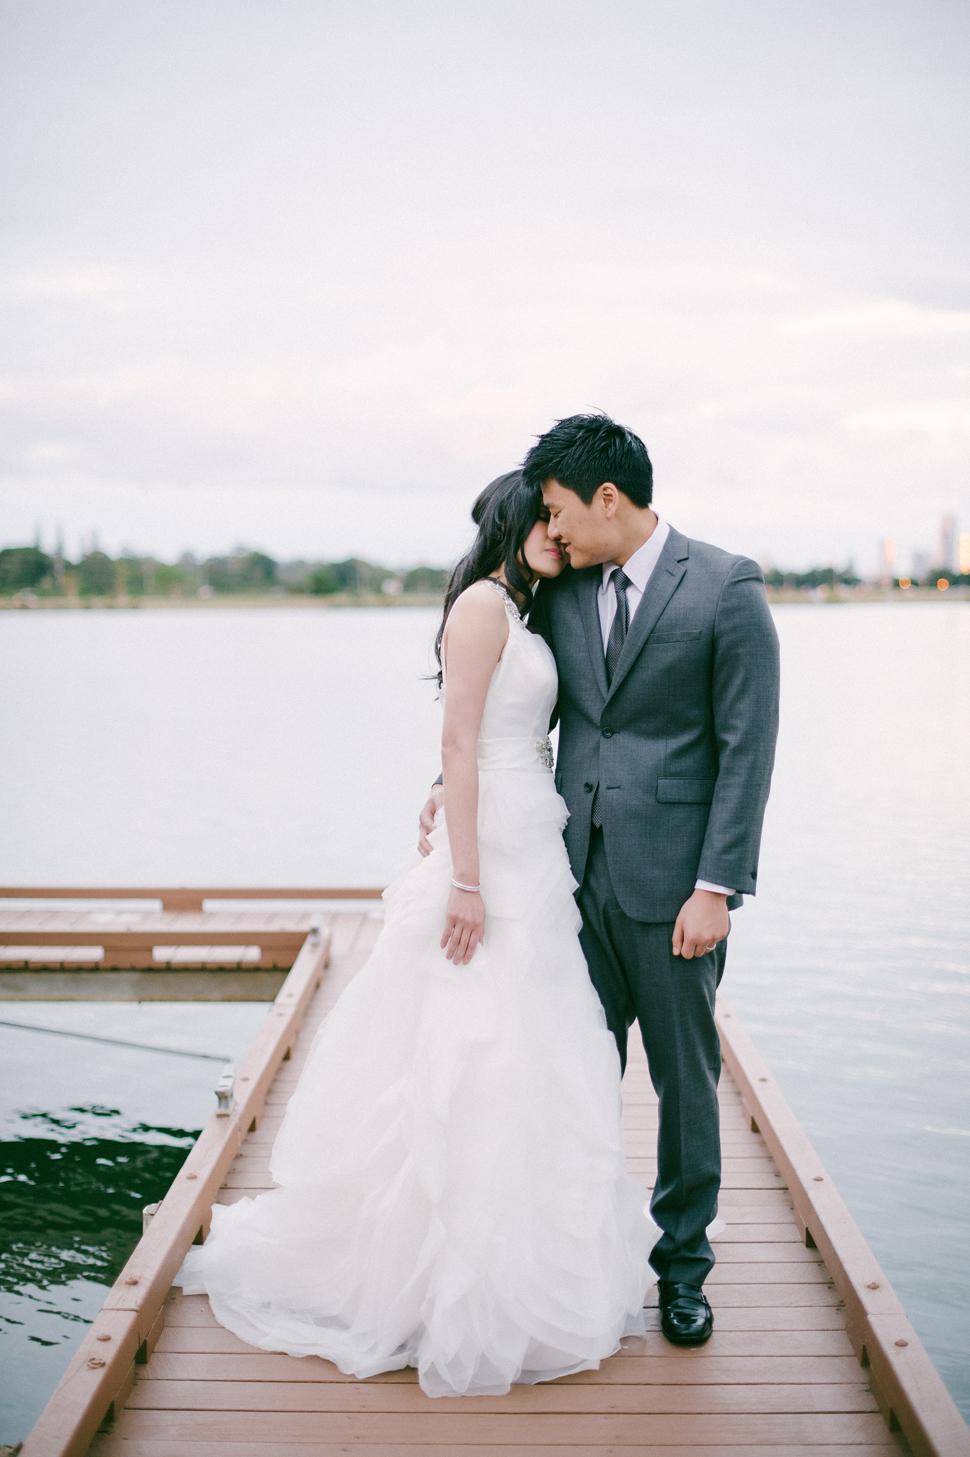 uyen-ron-wedding-emerald-lakes-gold-coast-photographer038